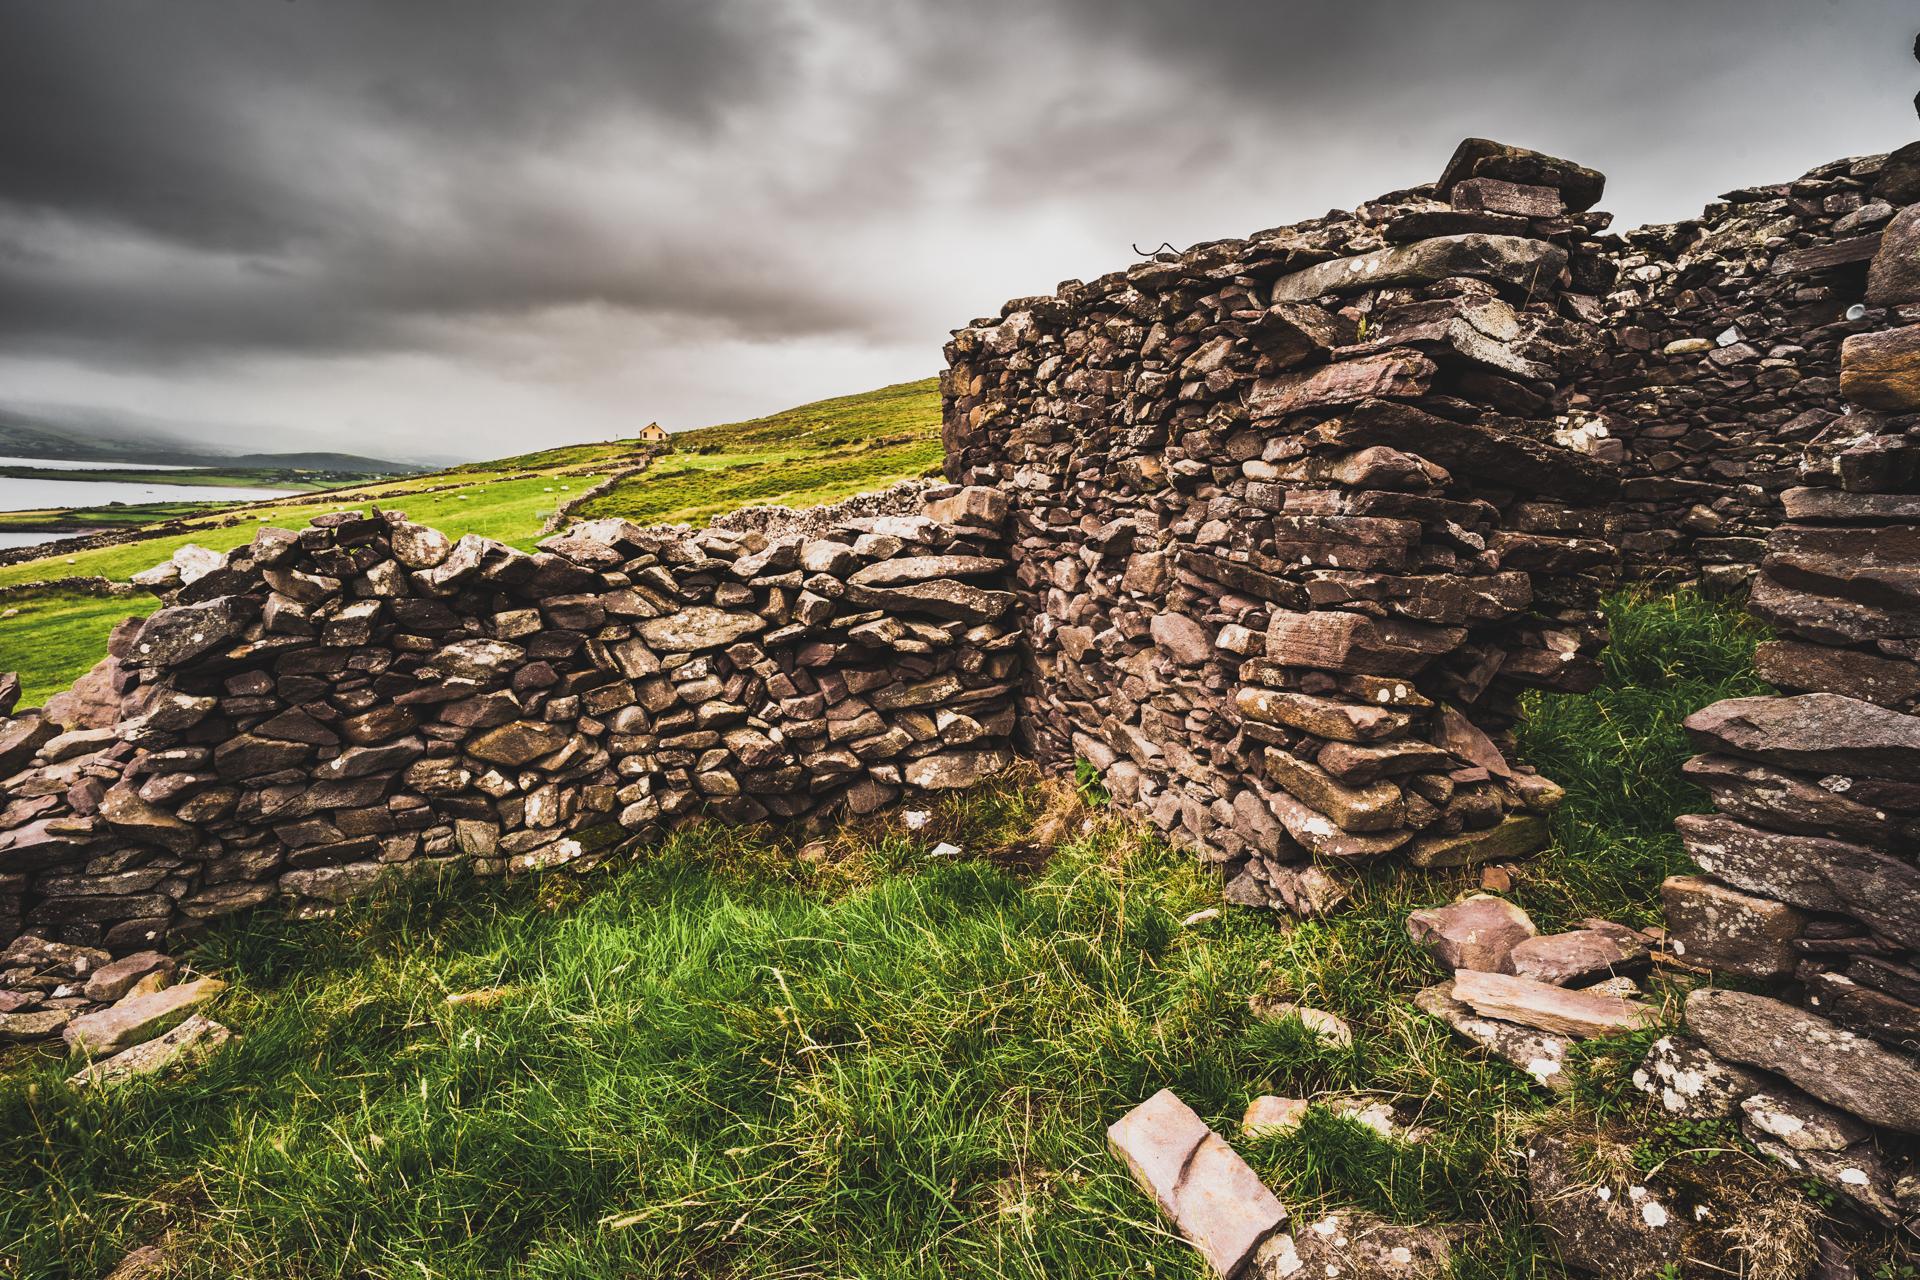 Ireland. Wild Atlantic Way. Kerry. Counthy Kerry. Travel photography. Landscape photography. Blog. Irish. Travelling Ireland. Ireland west coast. Wild Landscape. Trip. Vacation. -8.jpg